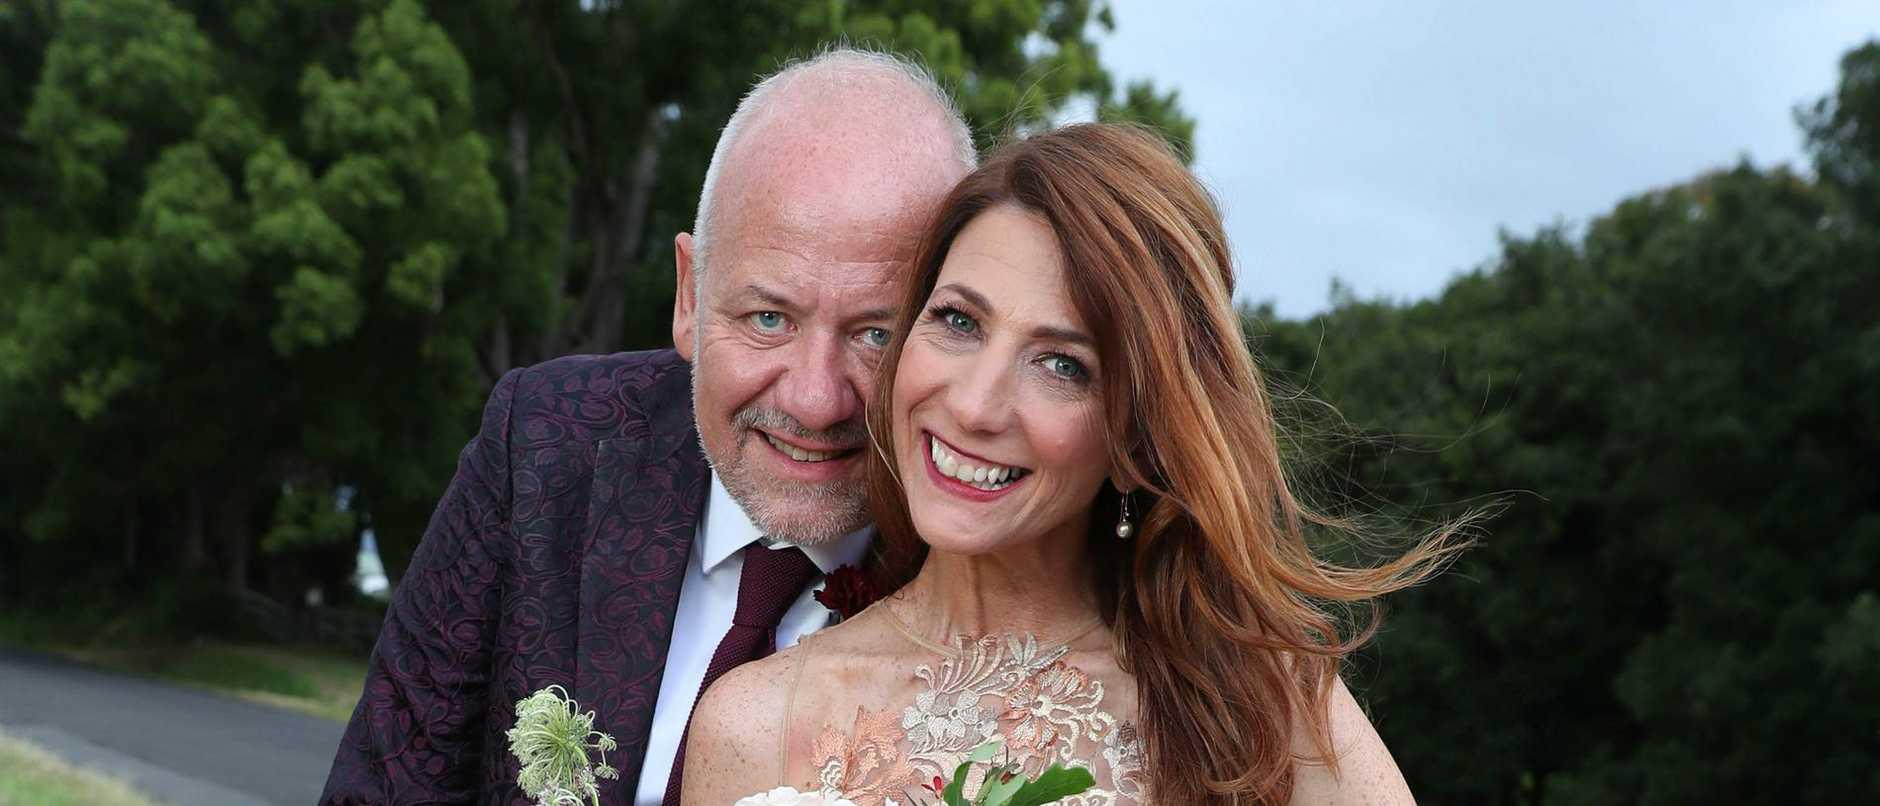 Robin Bailey's wedding to Sean Pickwell.